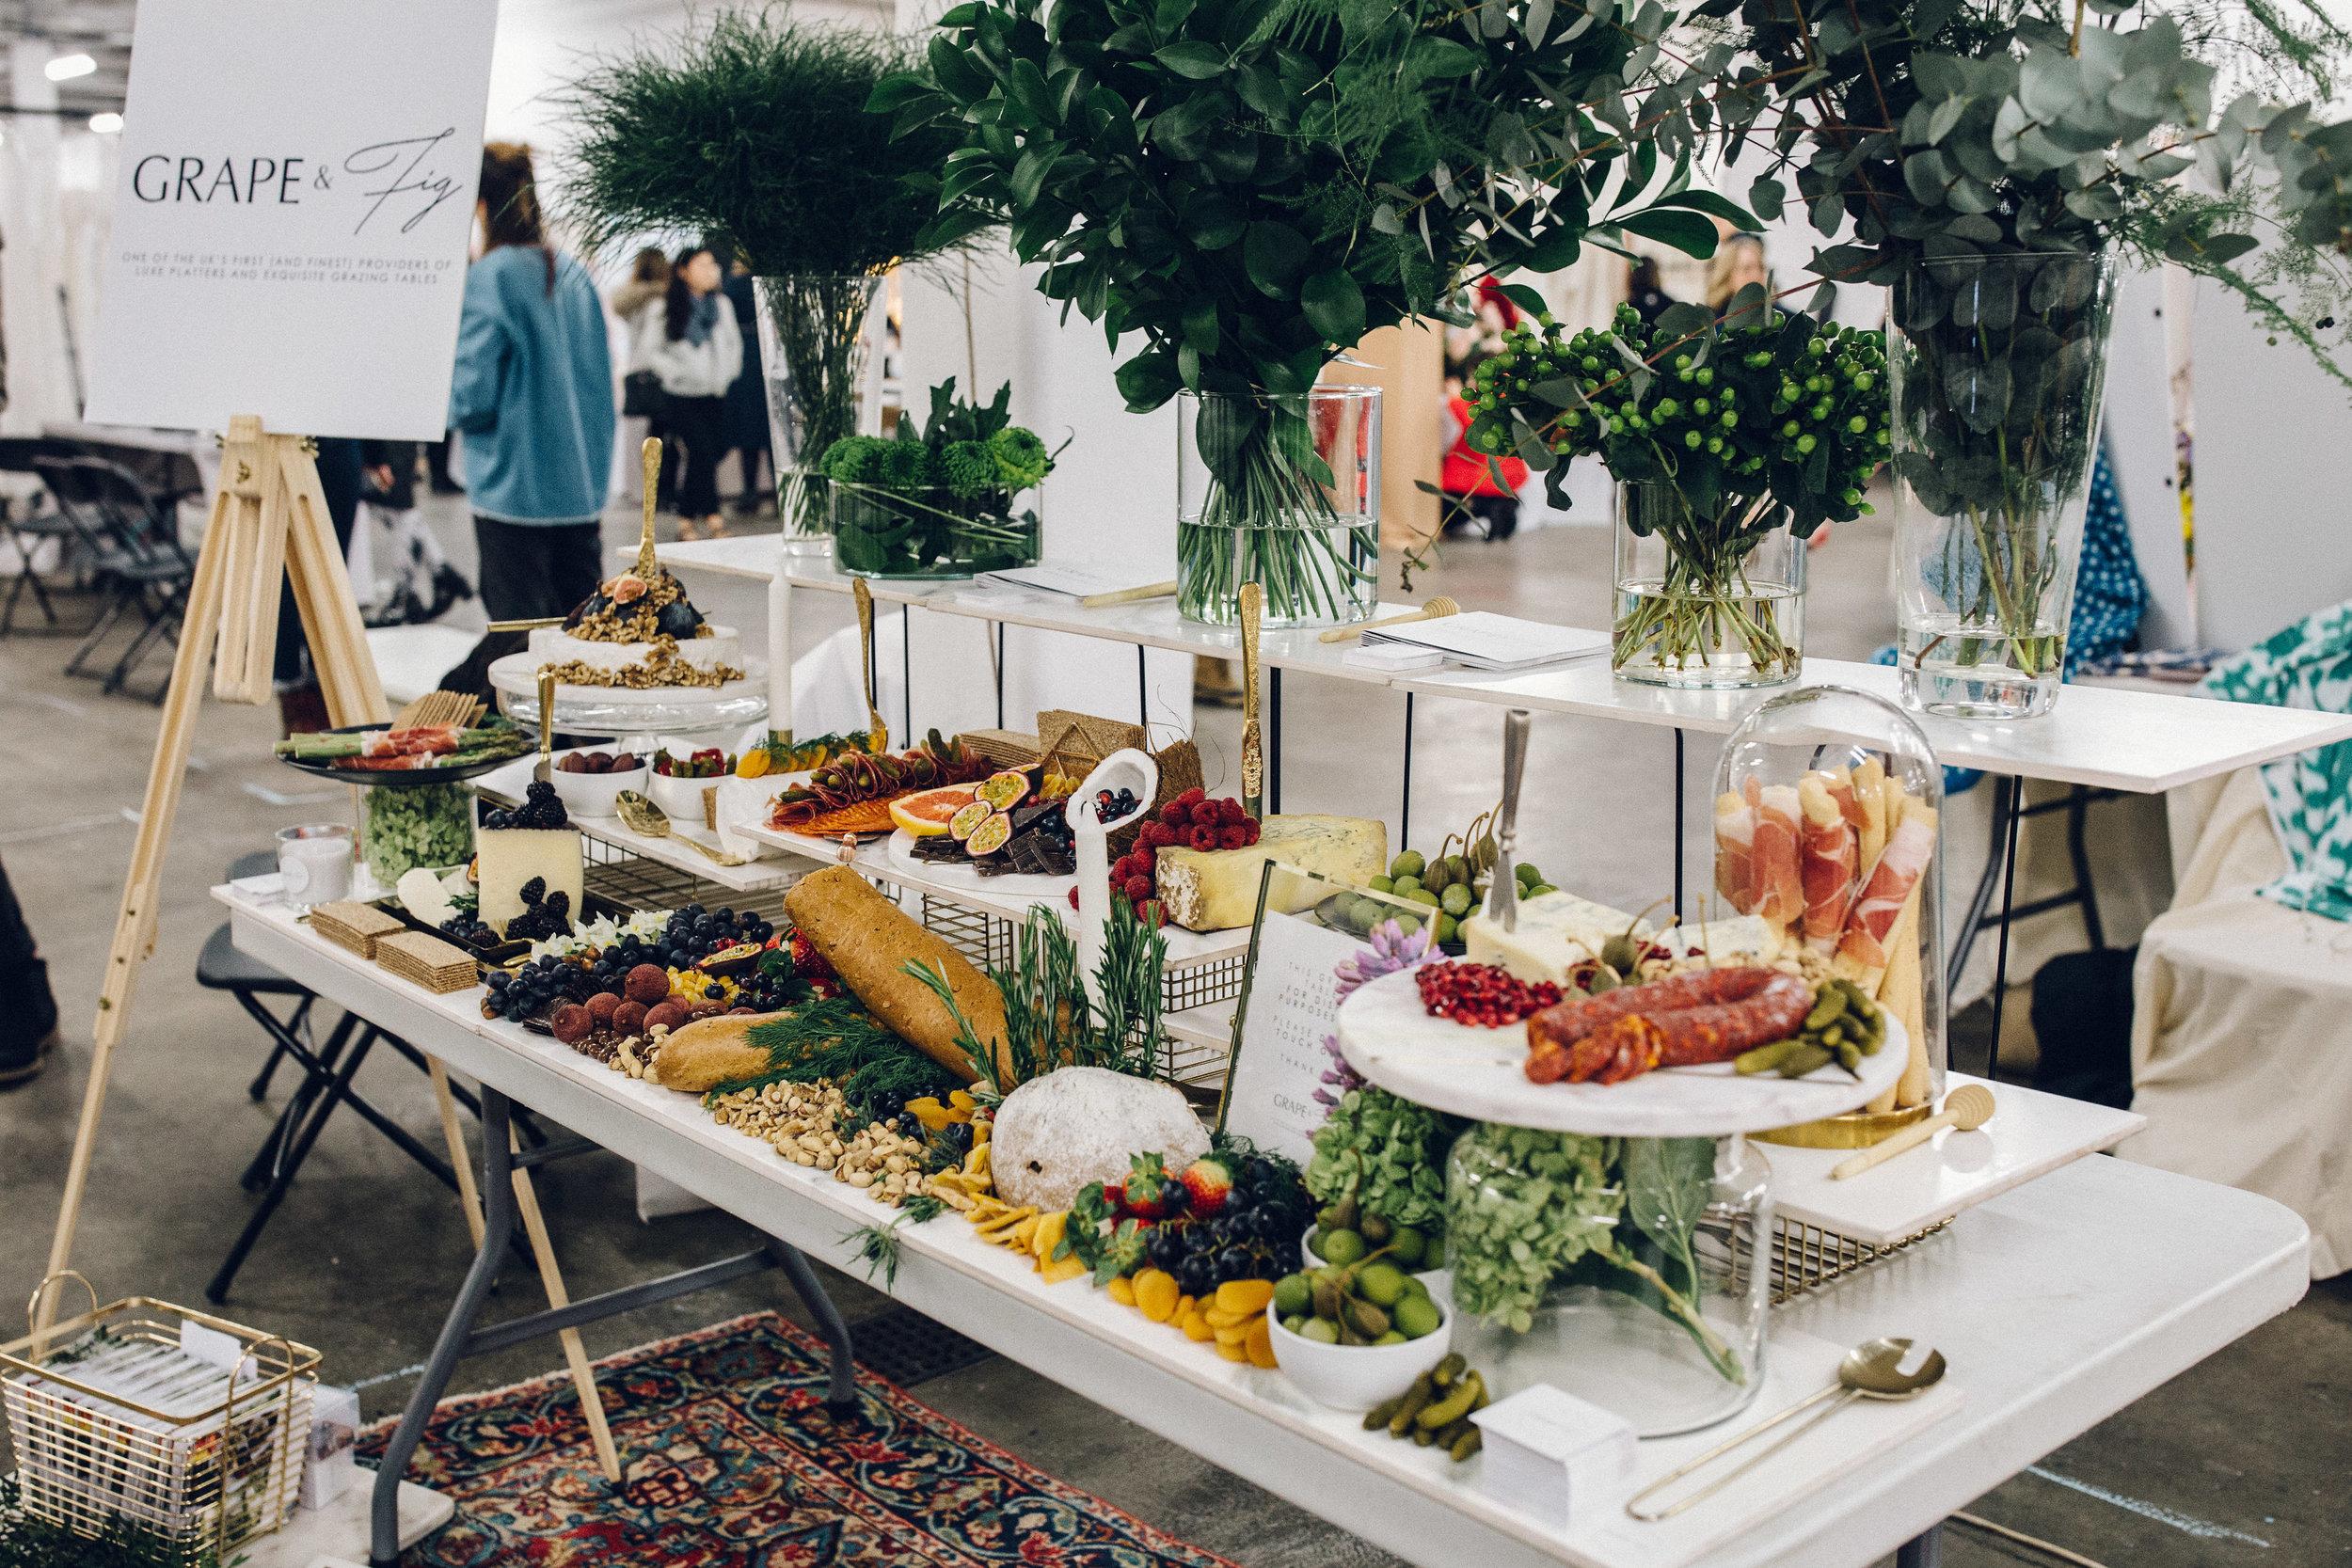 Alternative Wedding Food Ideas - Grazing Platters Grape & Fig